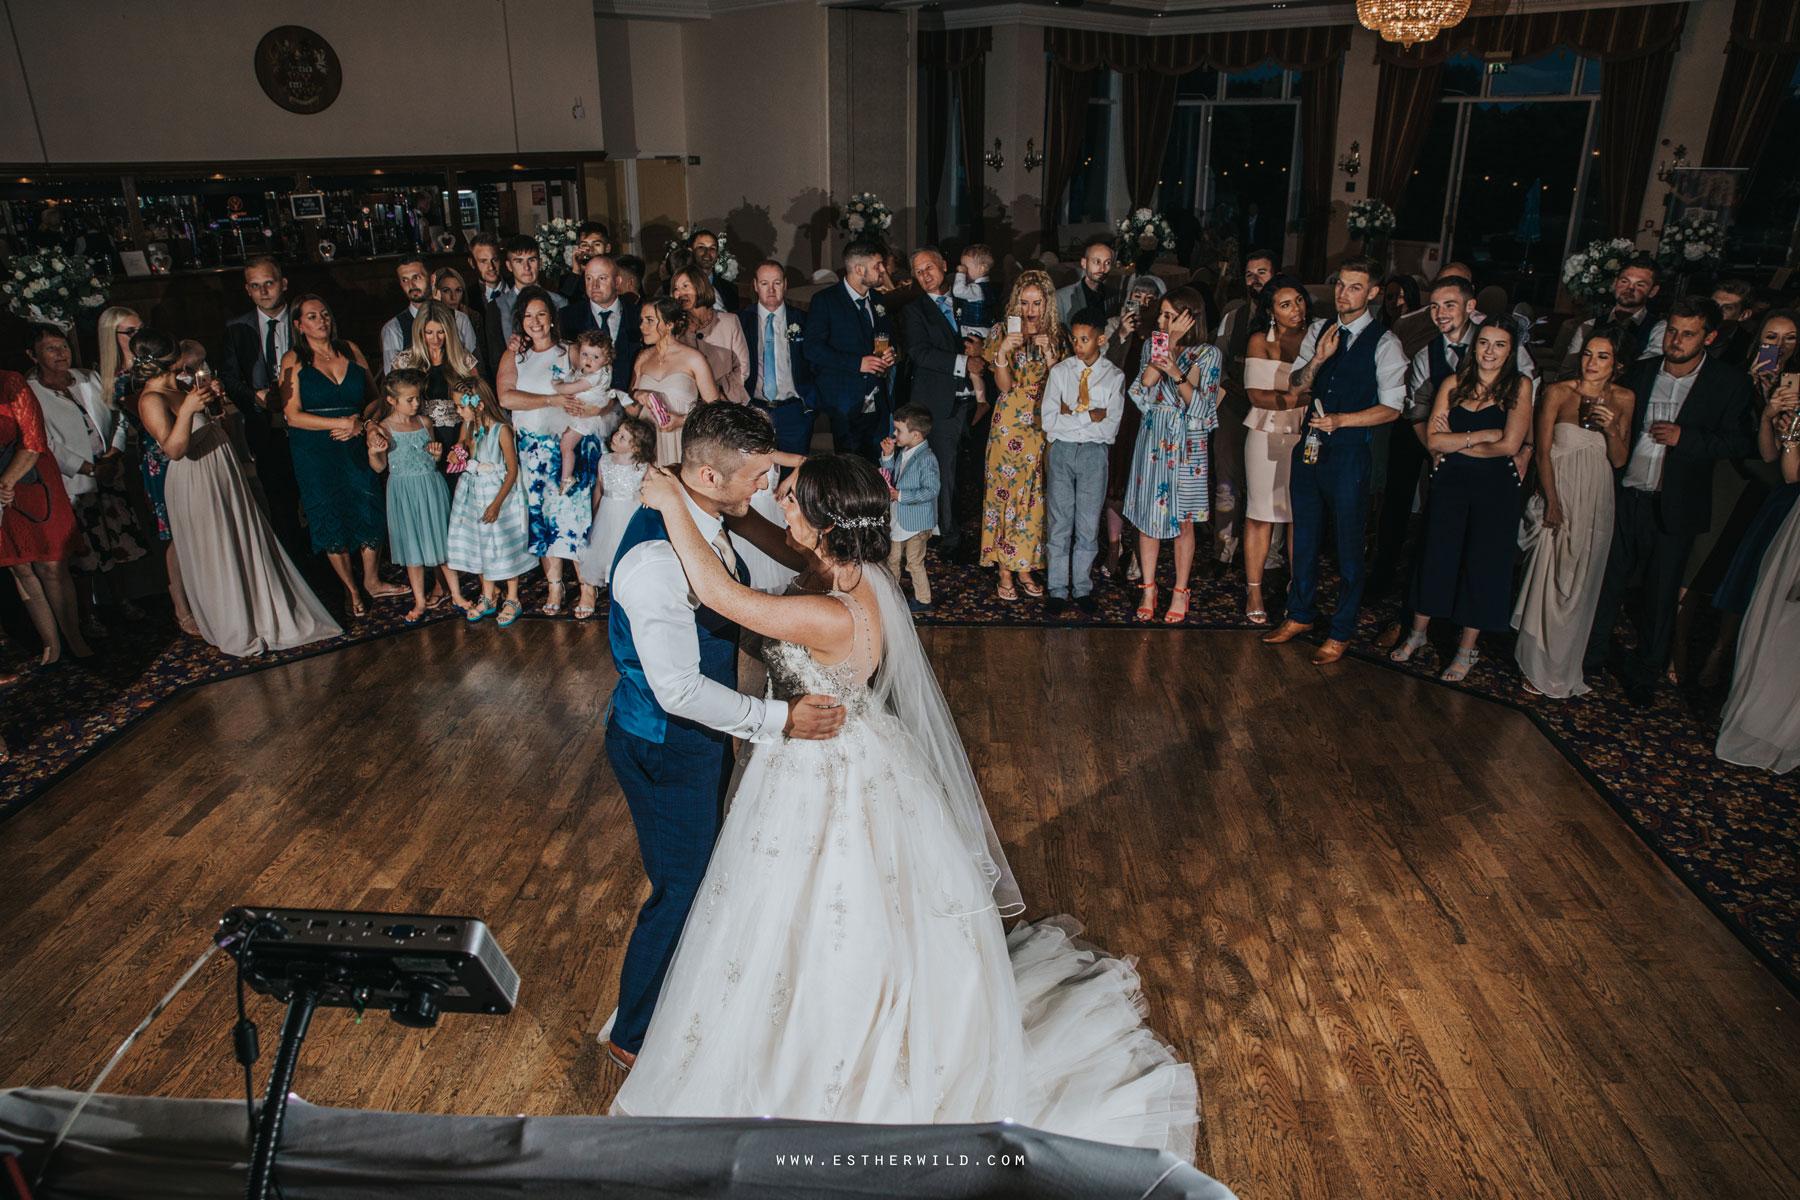 Lynford_Hall_Wedding_Thetford_Mundford_Esther_Wild_Photographer_IMG_3470.jpg